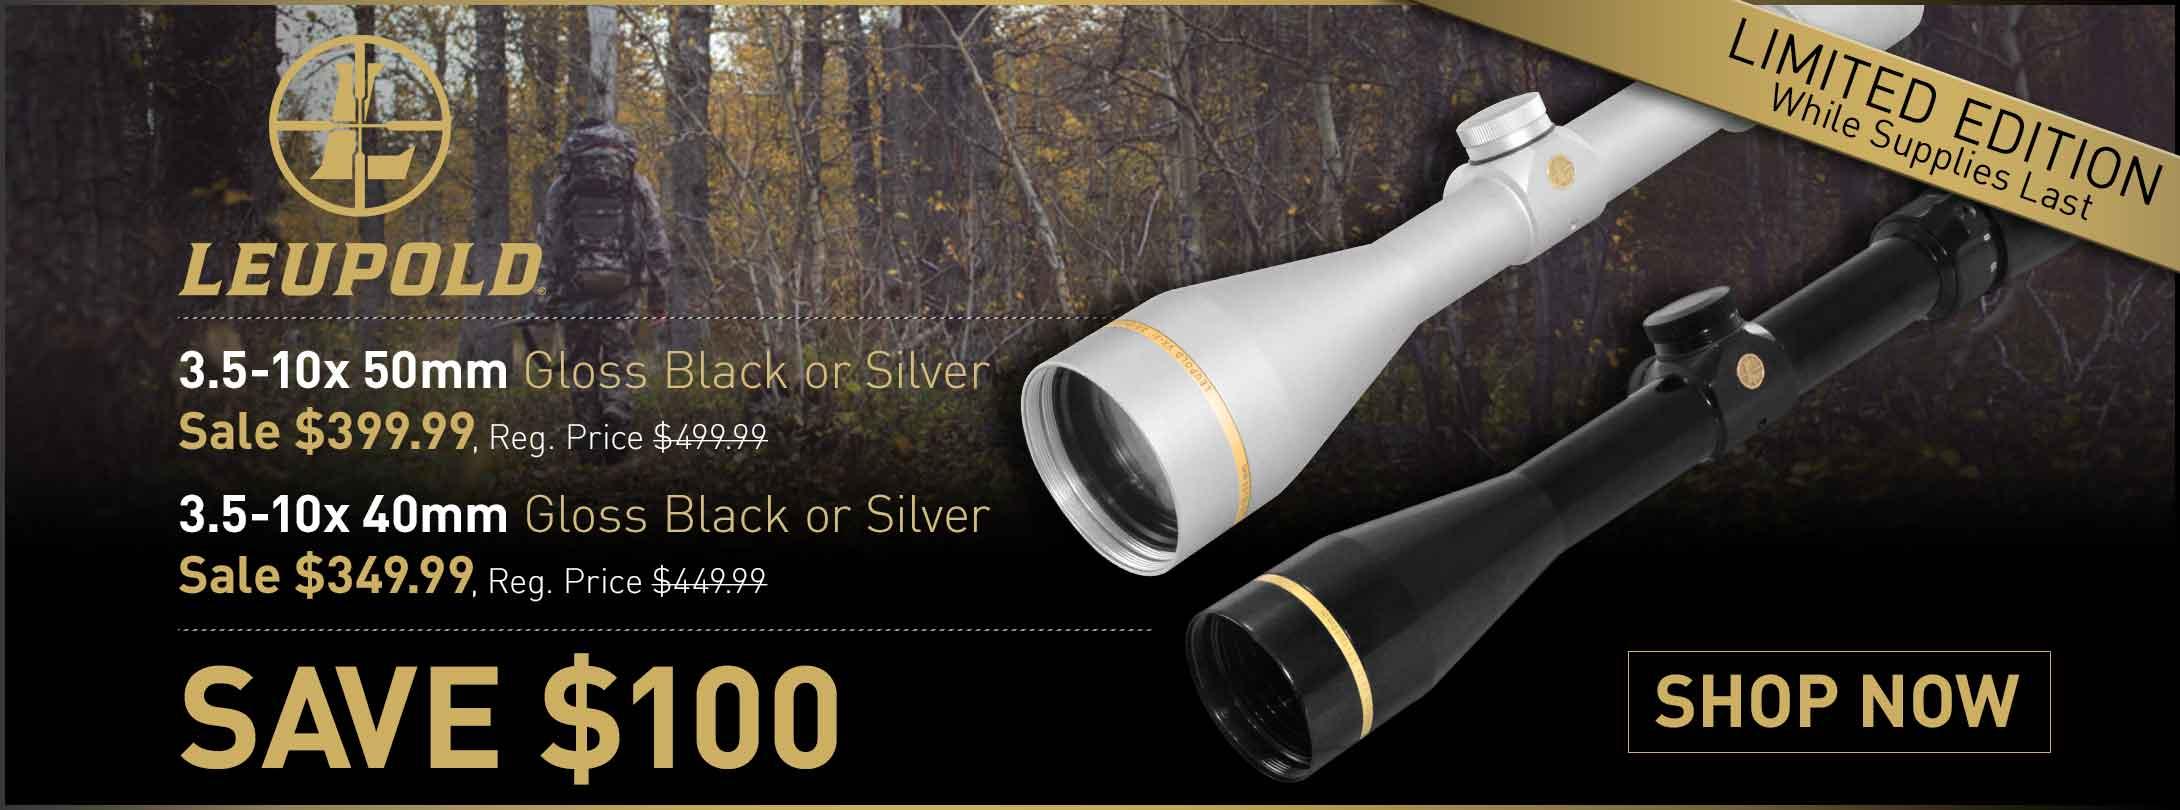 Save $100 on Leupold VX-3i Rifle Scopes Sliver & Gloss